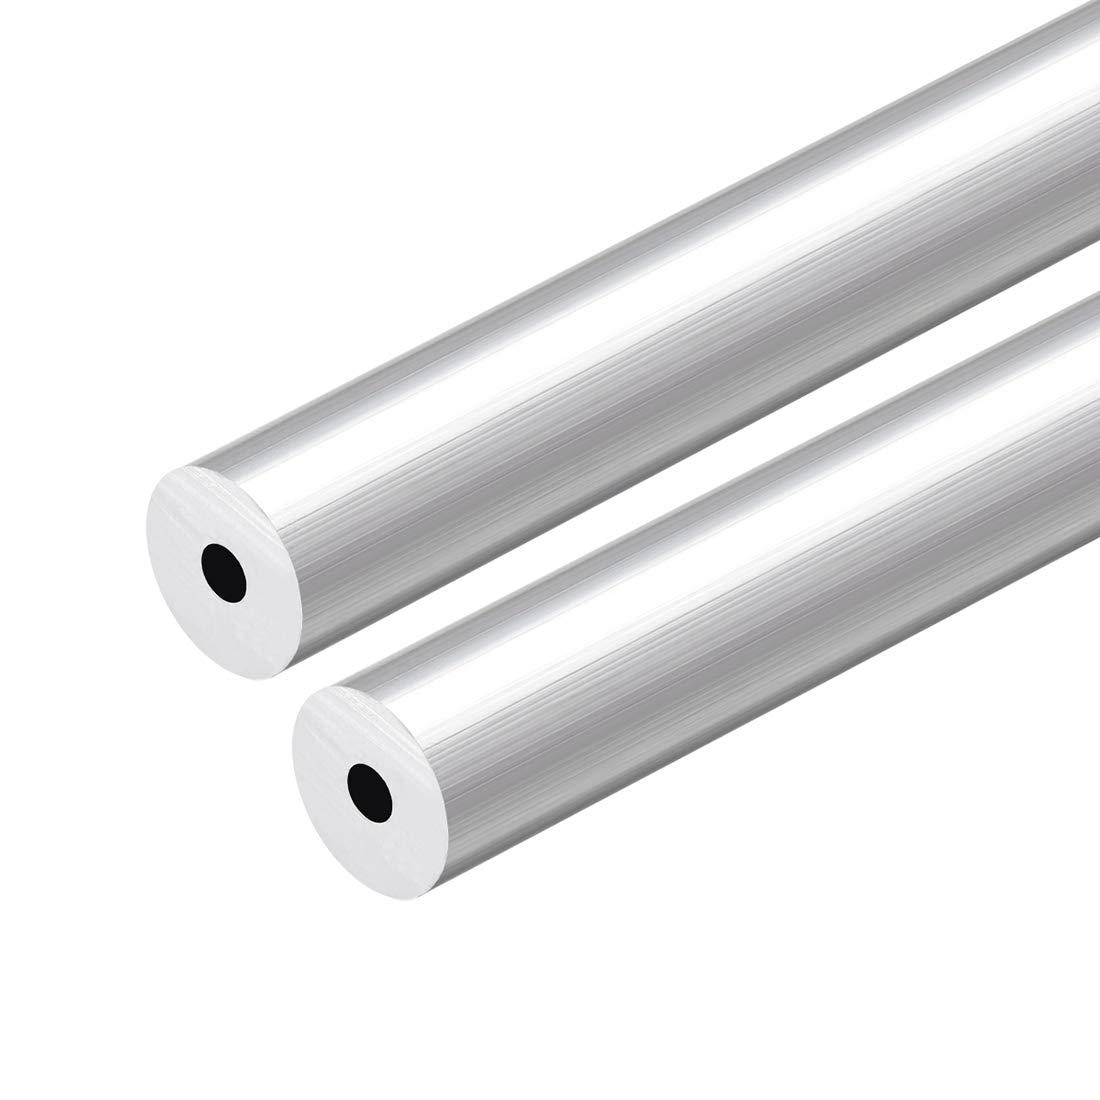 uxcell 6063 Aluminum Round Tube 300mm Length 18mm OD 12mm ID Seamless Aluminum Straight Tubing 2 Pcs